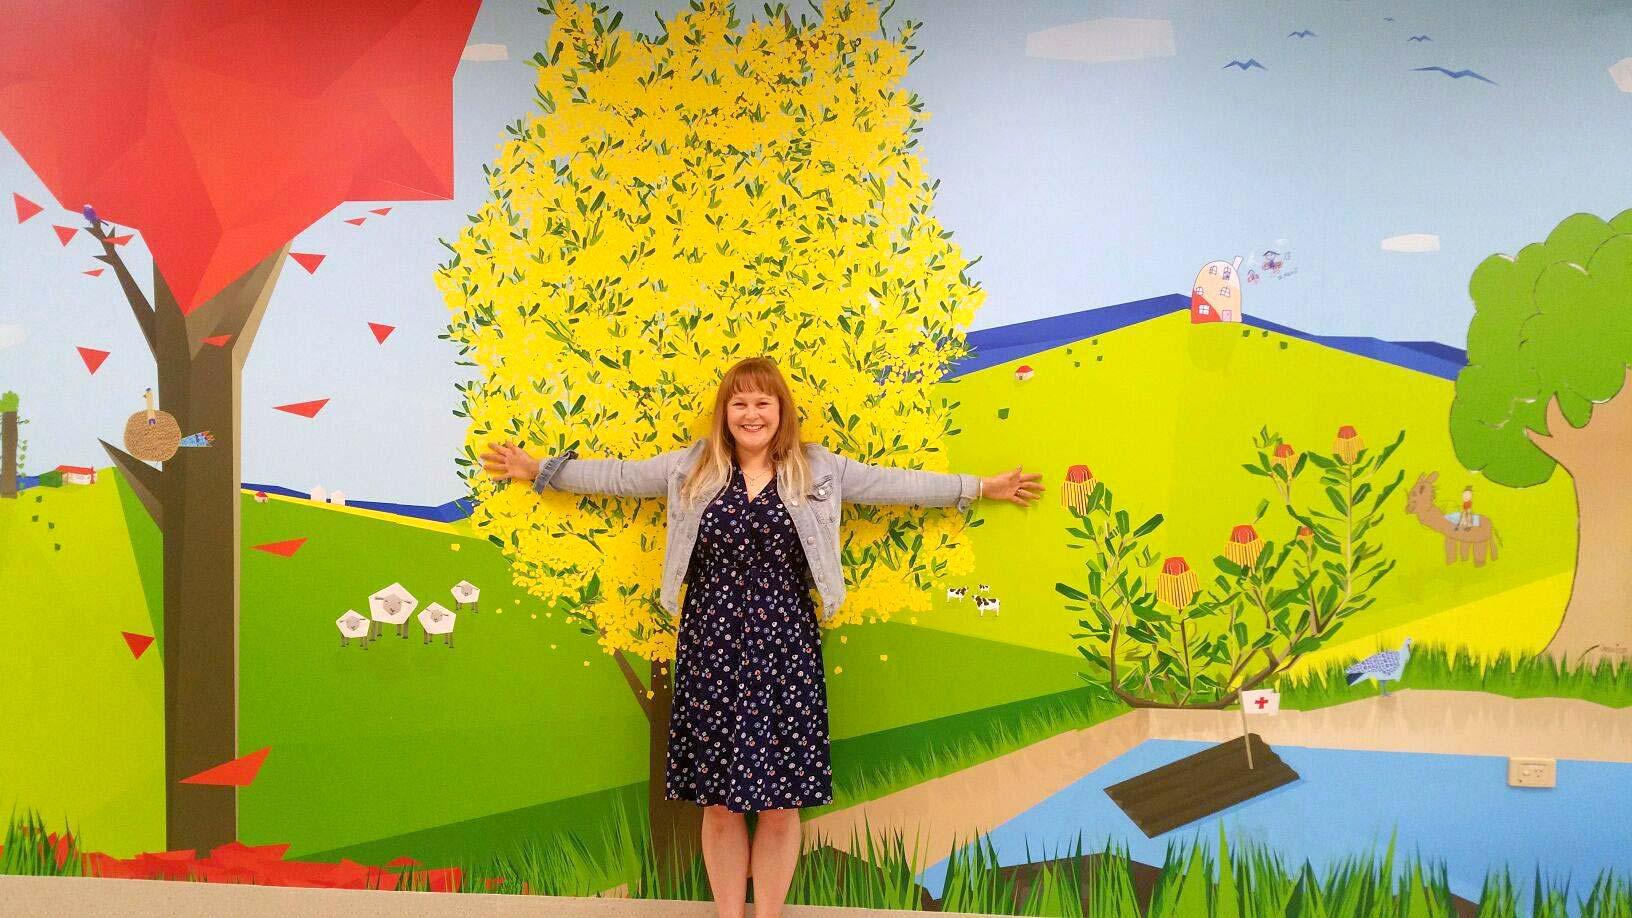 Wagga Wagga Rural Referral Hospital Children's Ward artwork - When Matilda Met Mallie